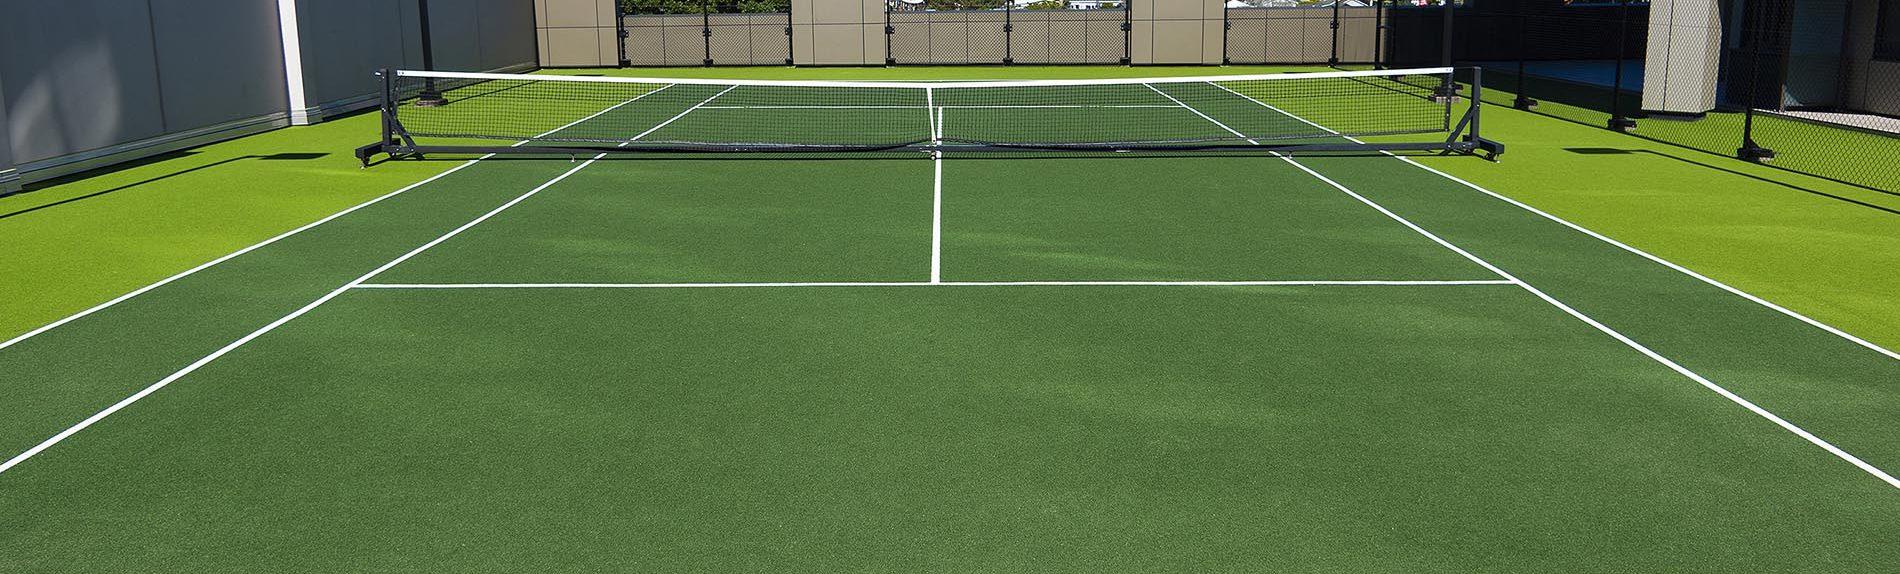 The Spencer Hotel, Takapuna Hotel, Spencer Hotel Tennis Court slidewhow HD